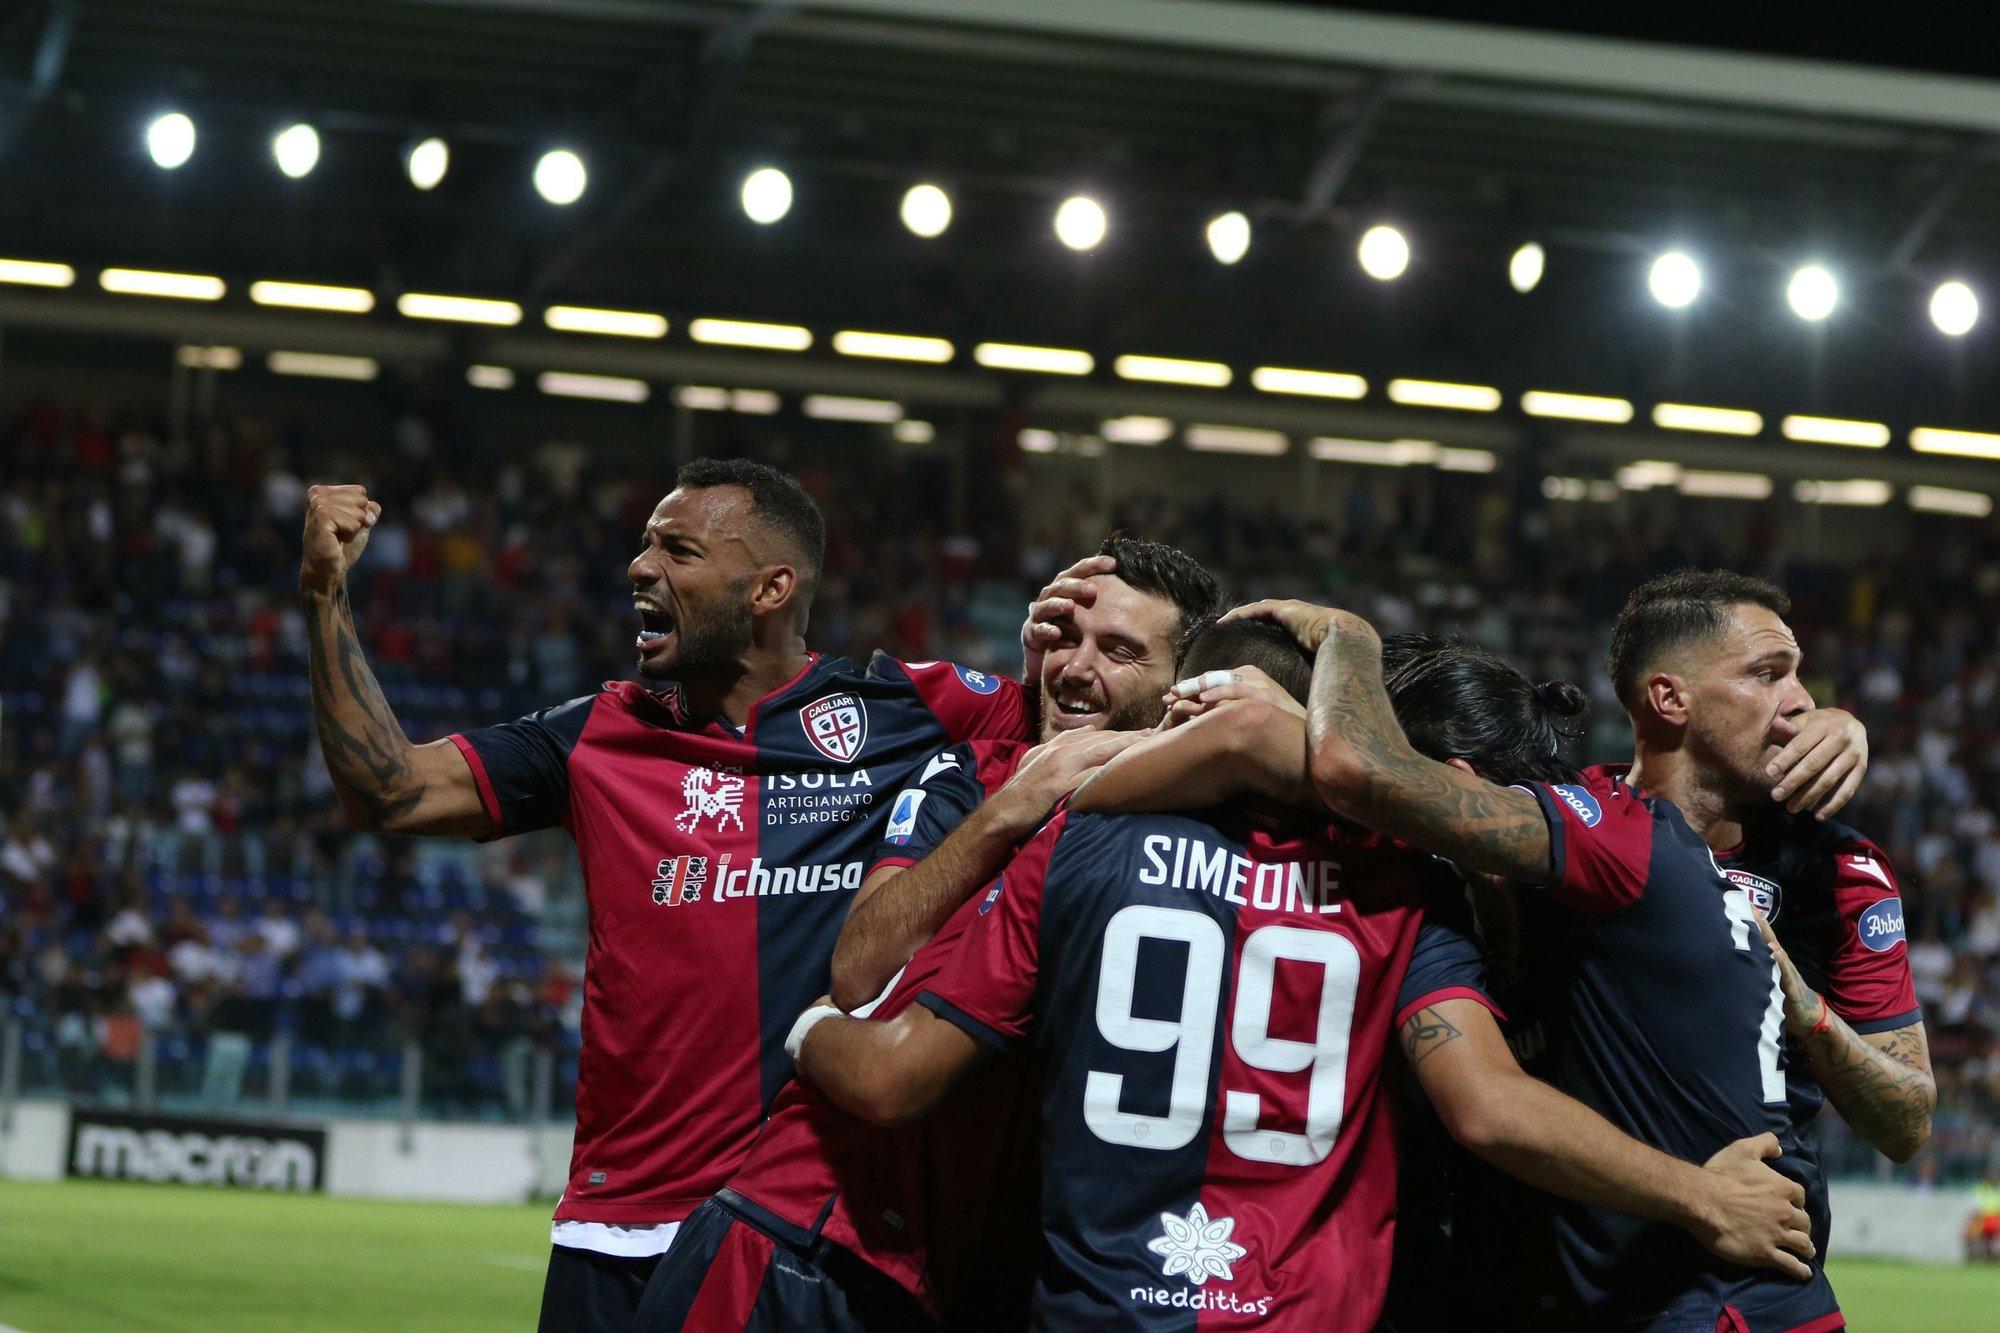 Cagliari wins 1st home match since racist Lukaku chants